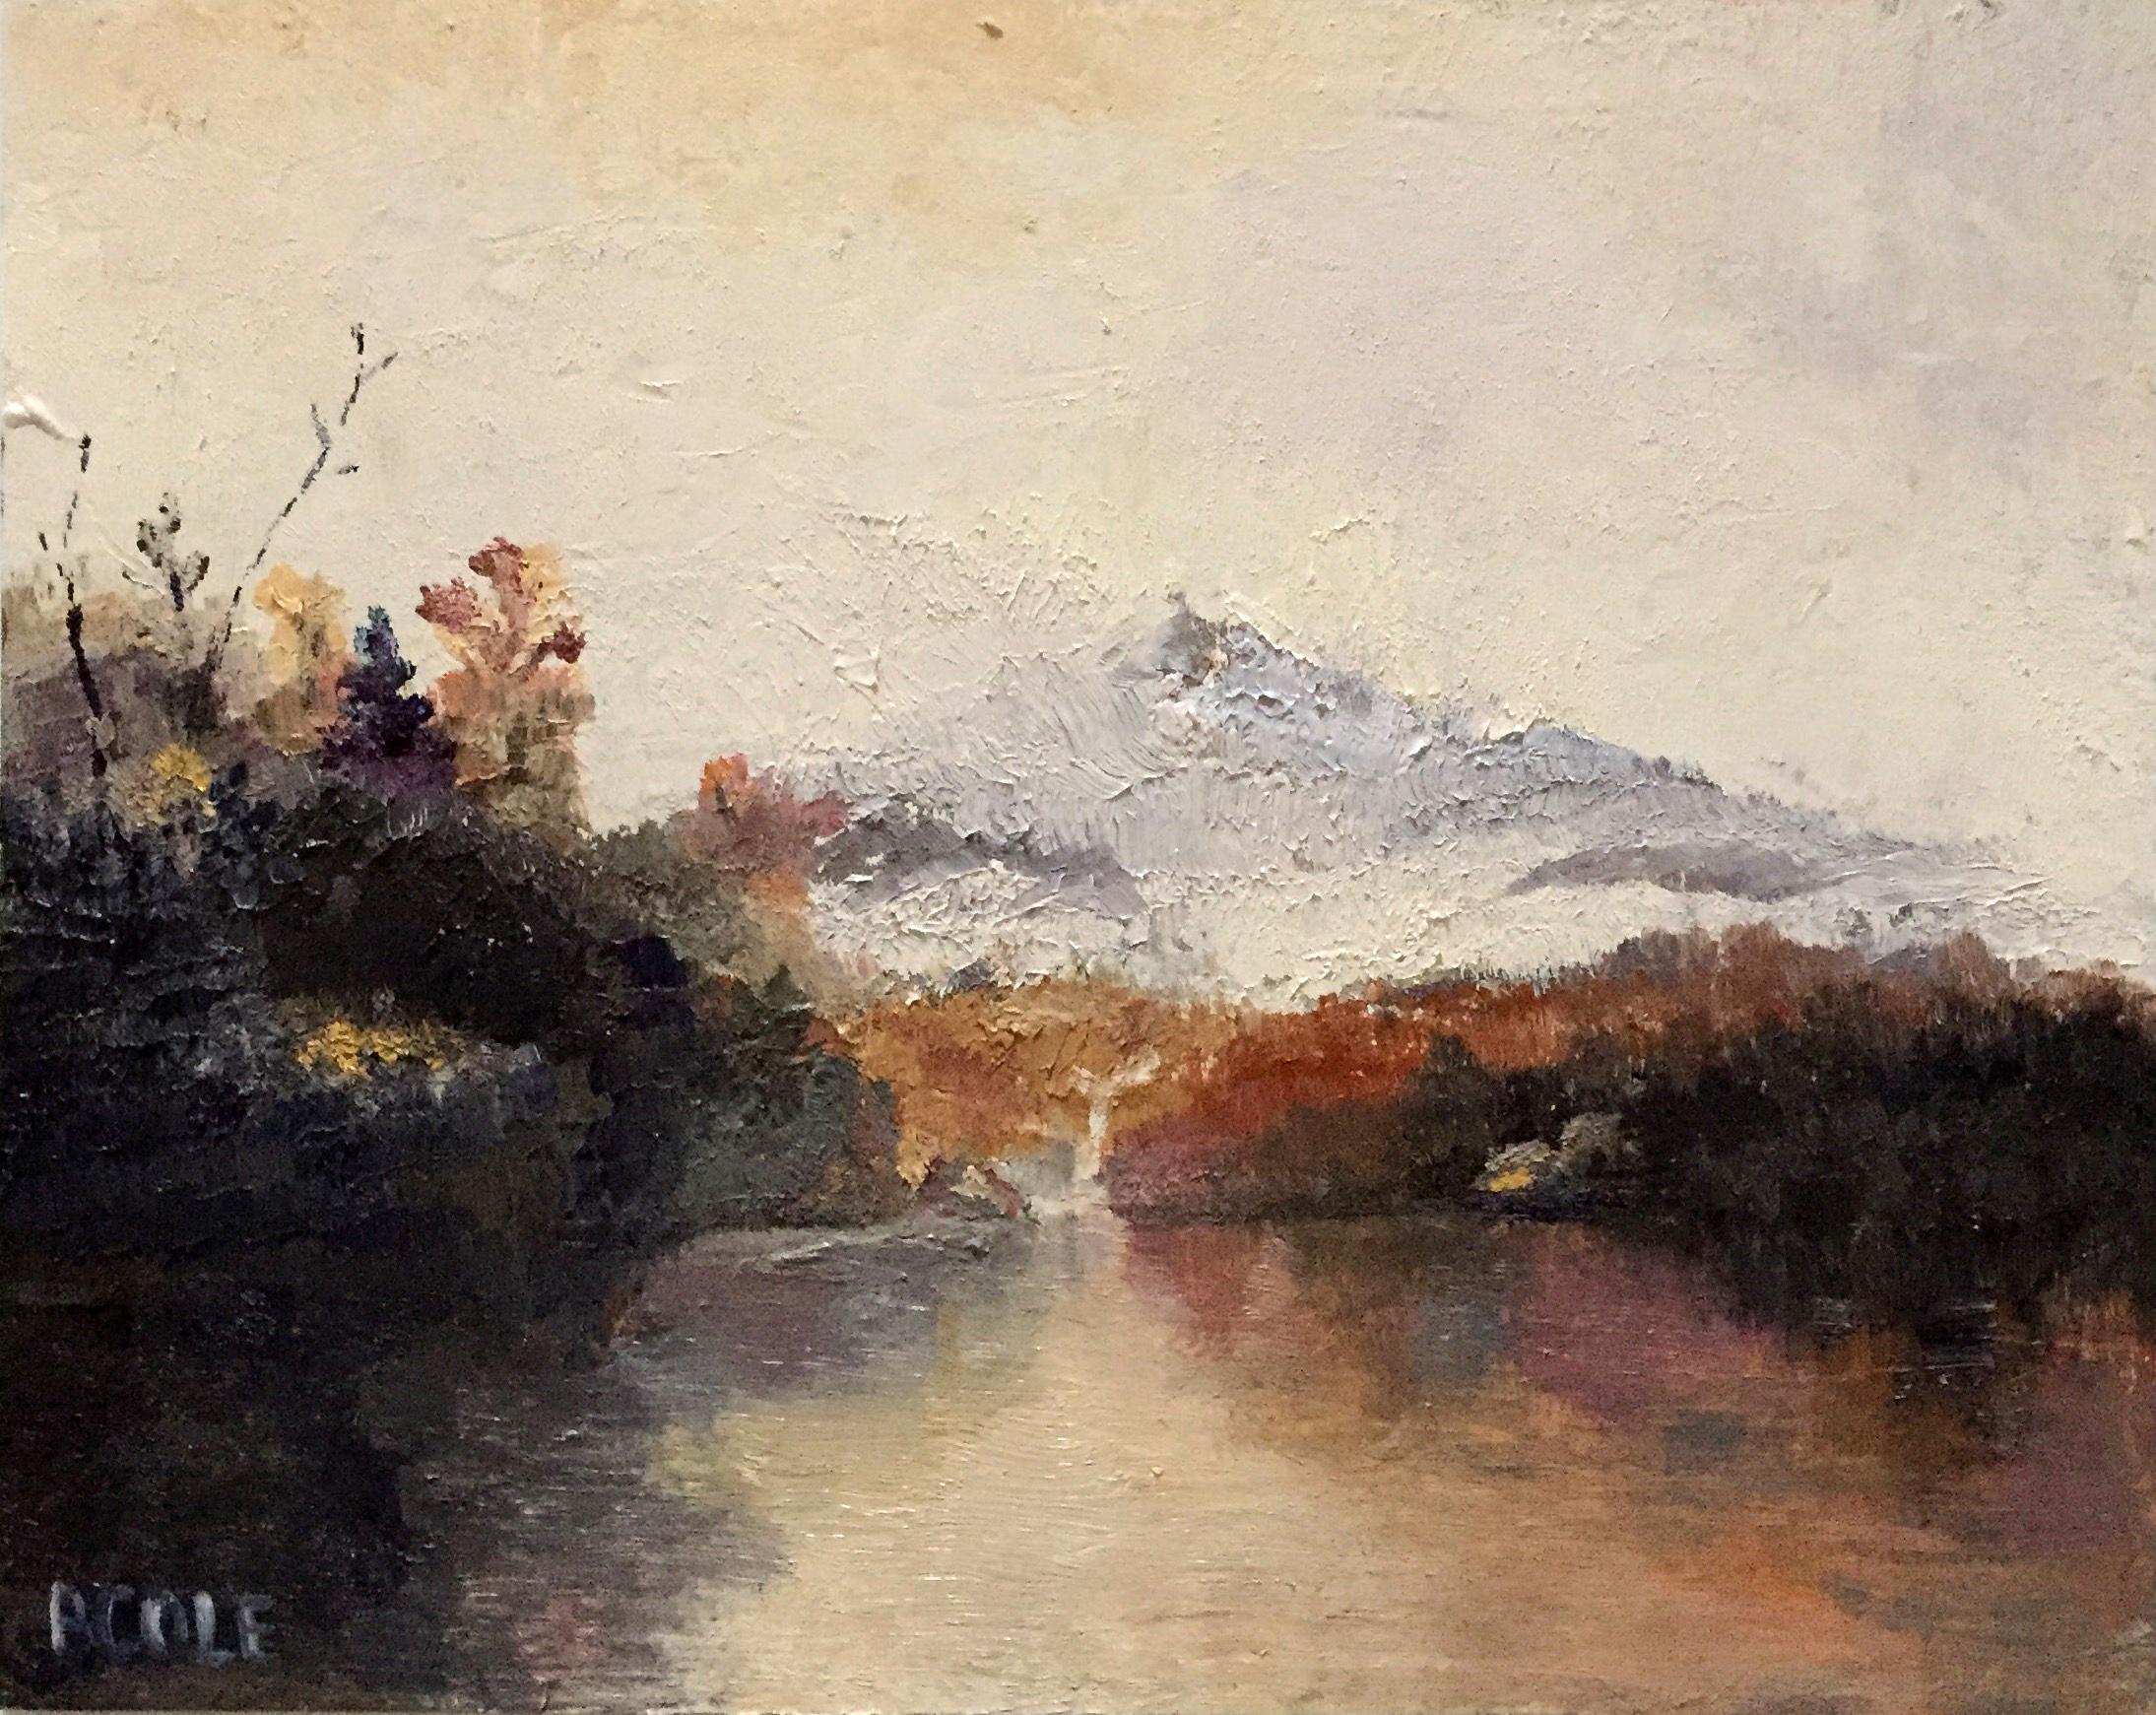 Beth Cole, Mountain Lake after John Frederick Kensett